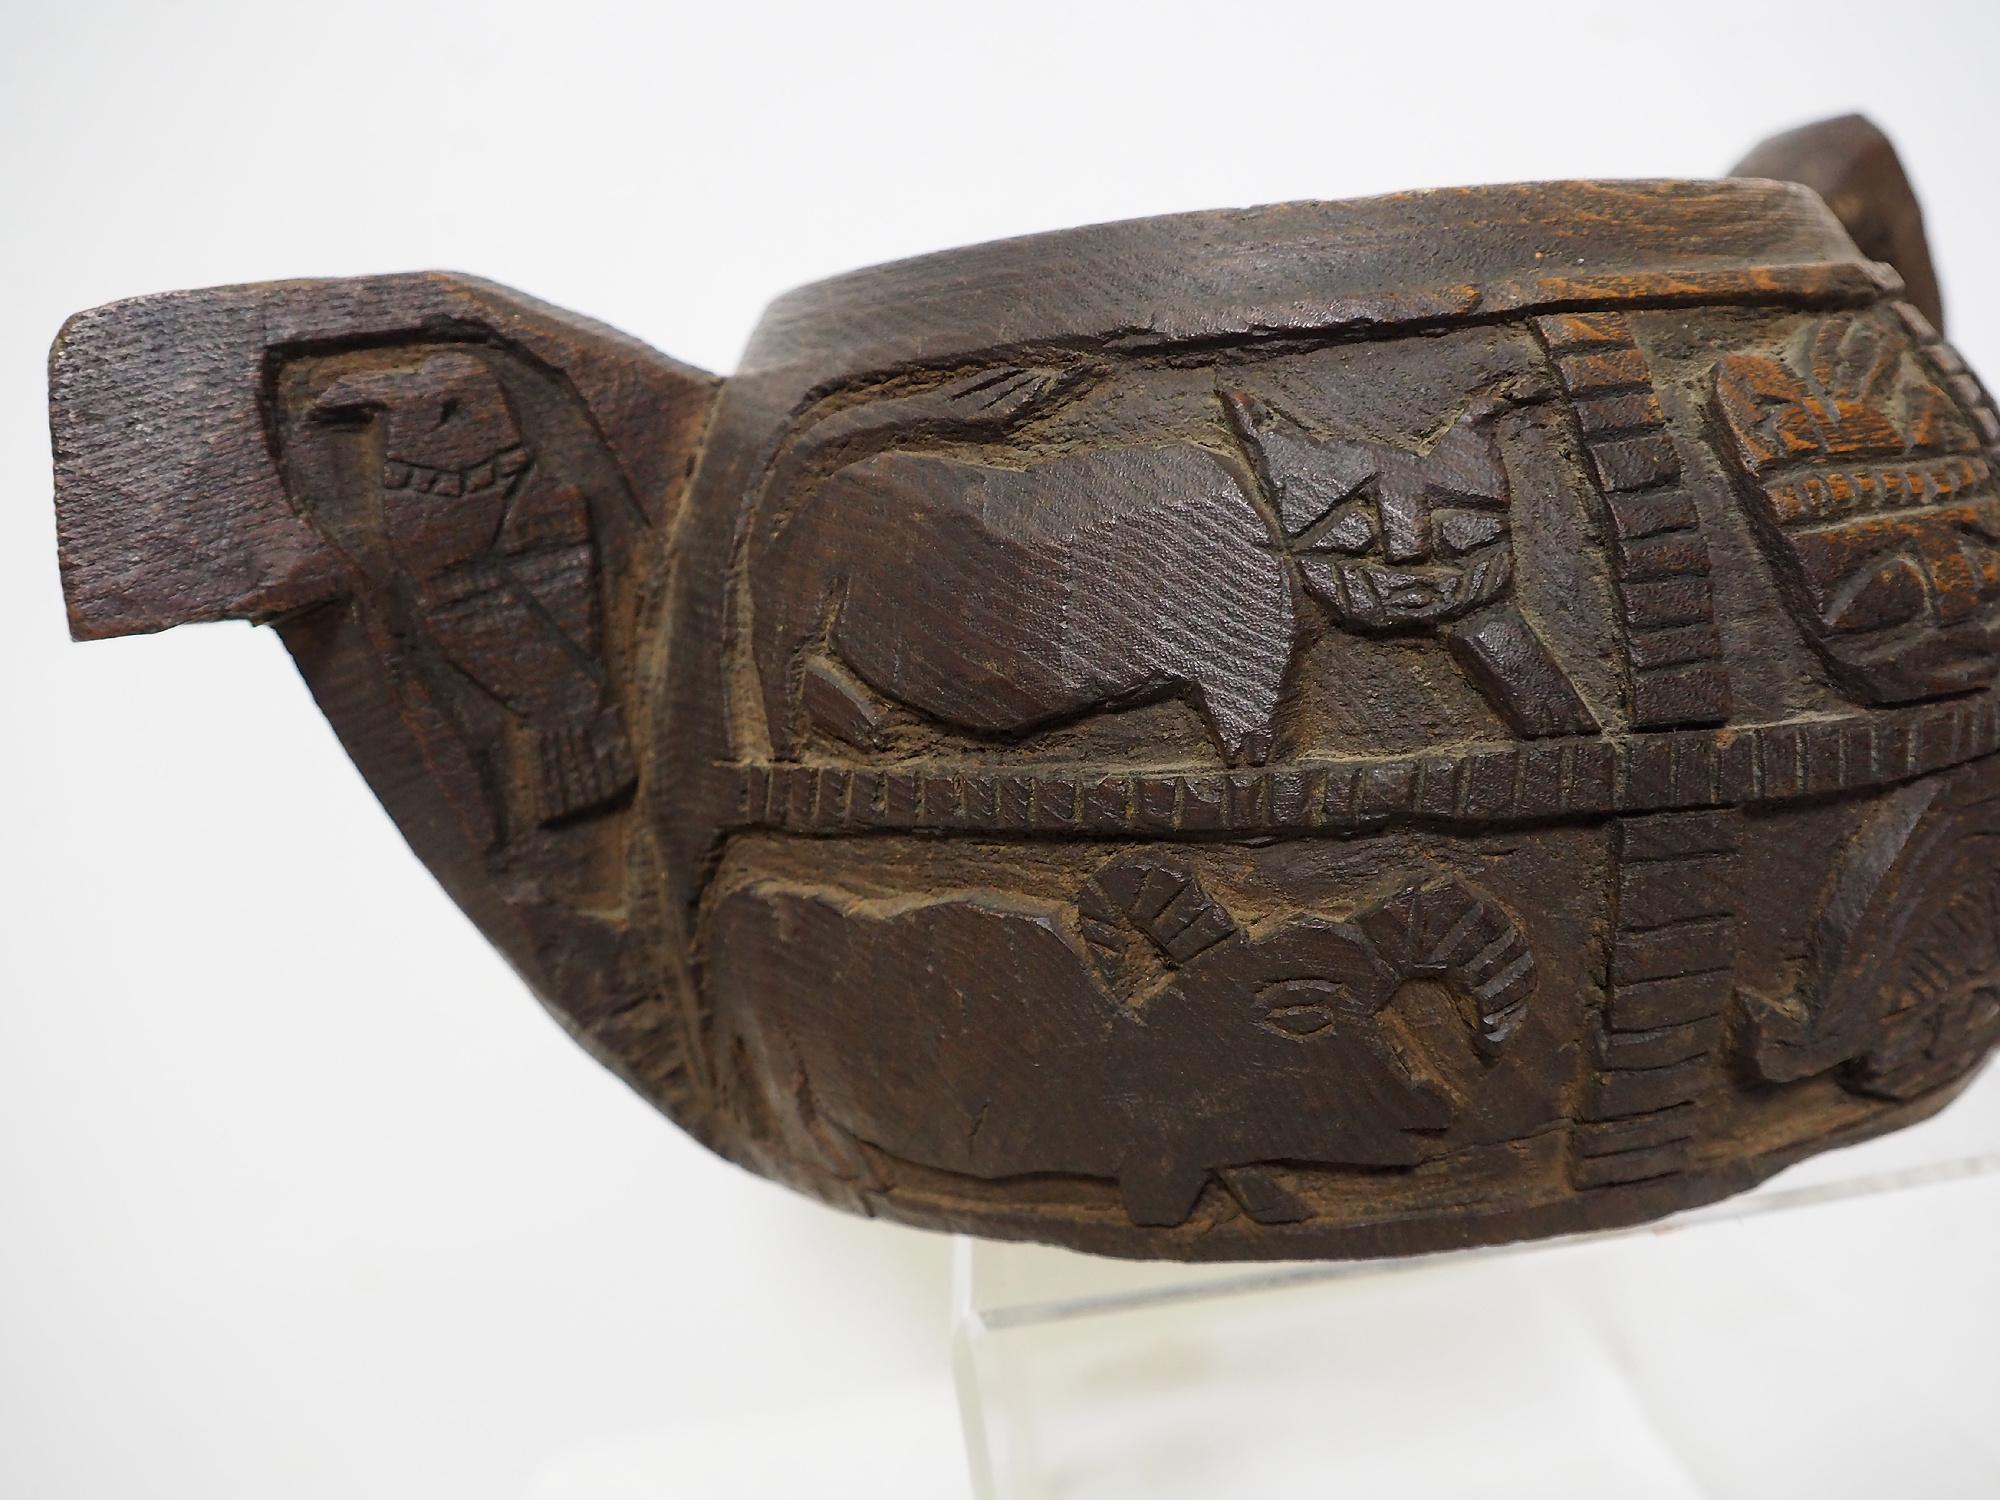 Antique wooden bowl  Nuristan Afghanistan No:19/3